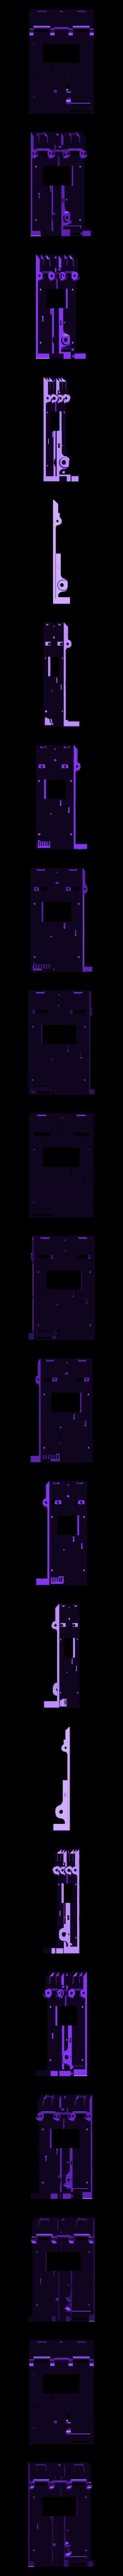 base.stl Download free STL file Throttle / Pedal • 3D printer template, Job